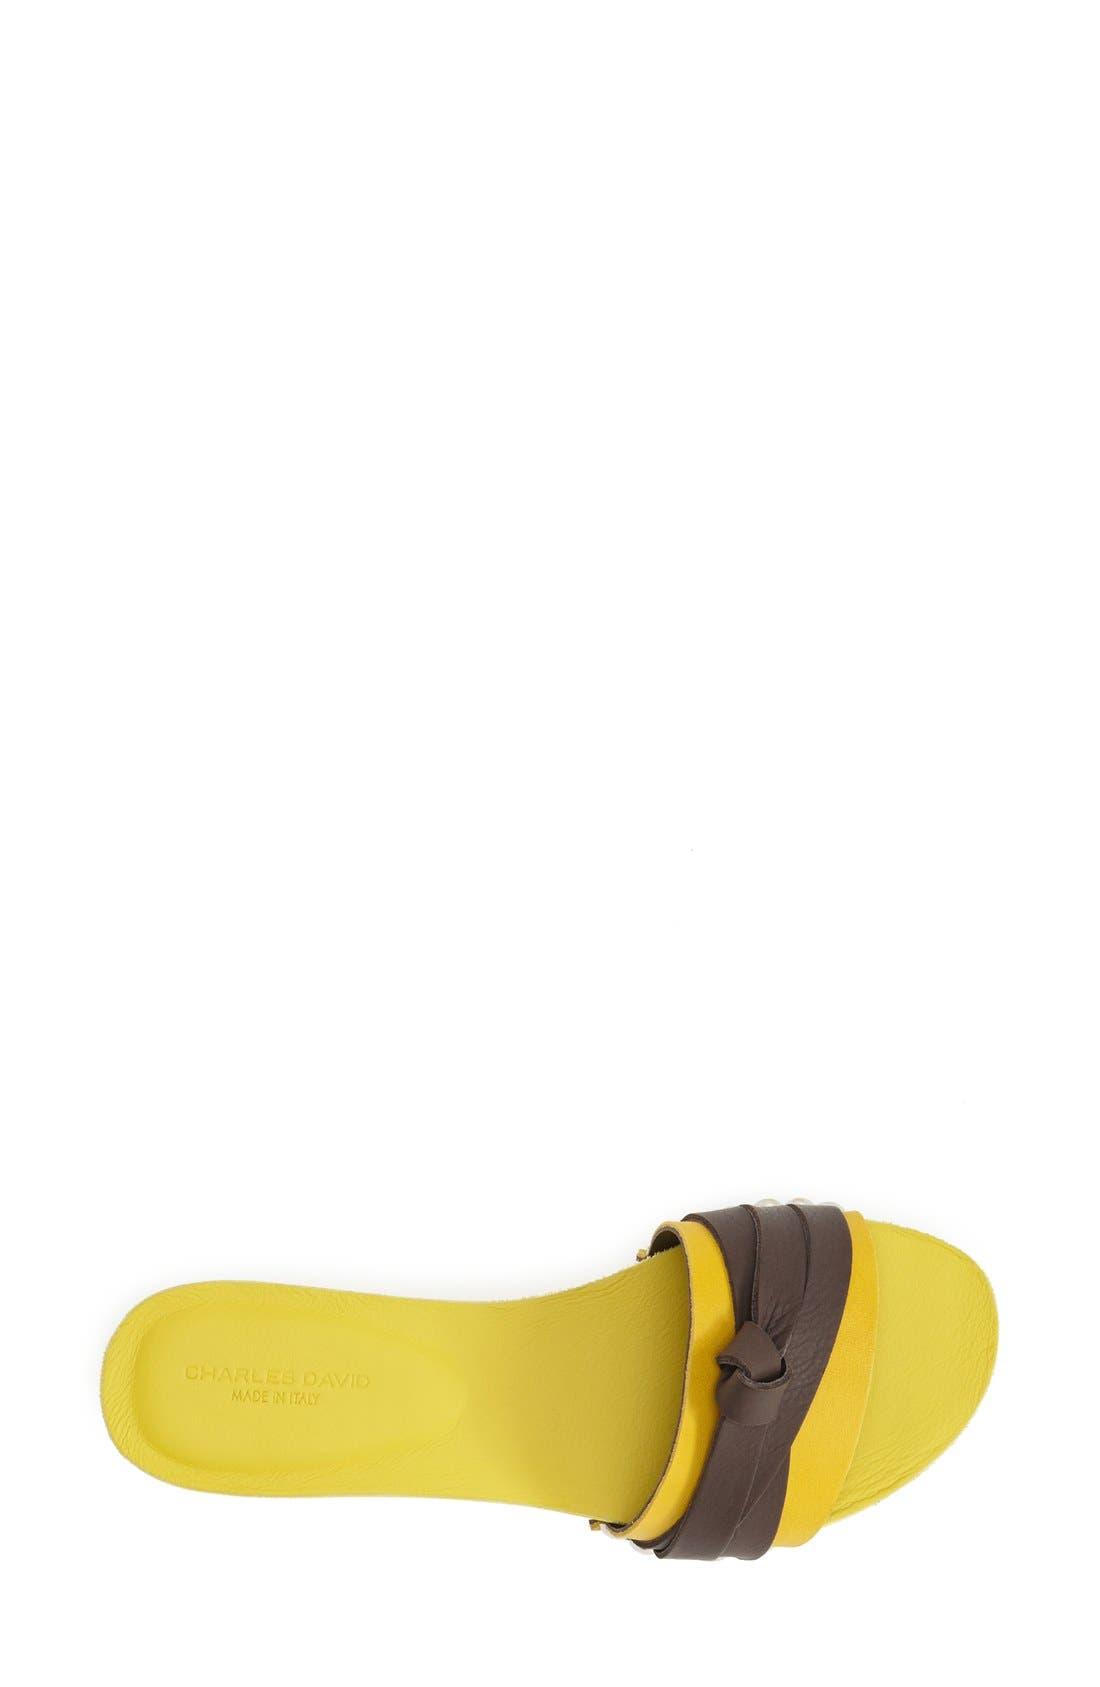 Alternate Image 3  - Charles David 'Becket' Slide Sandal (Women)